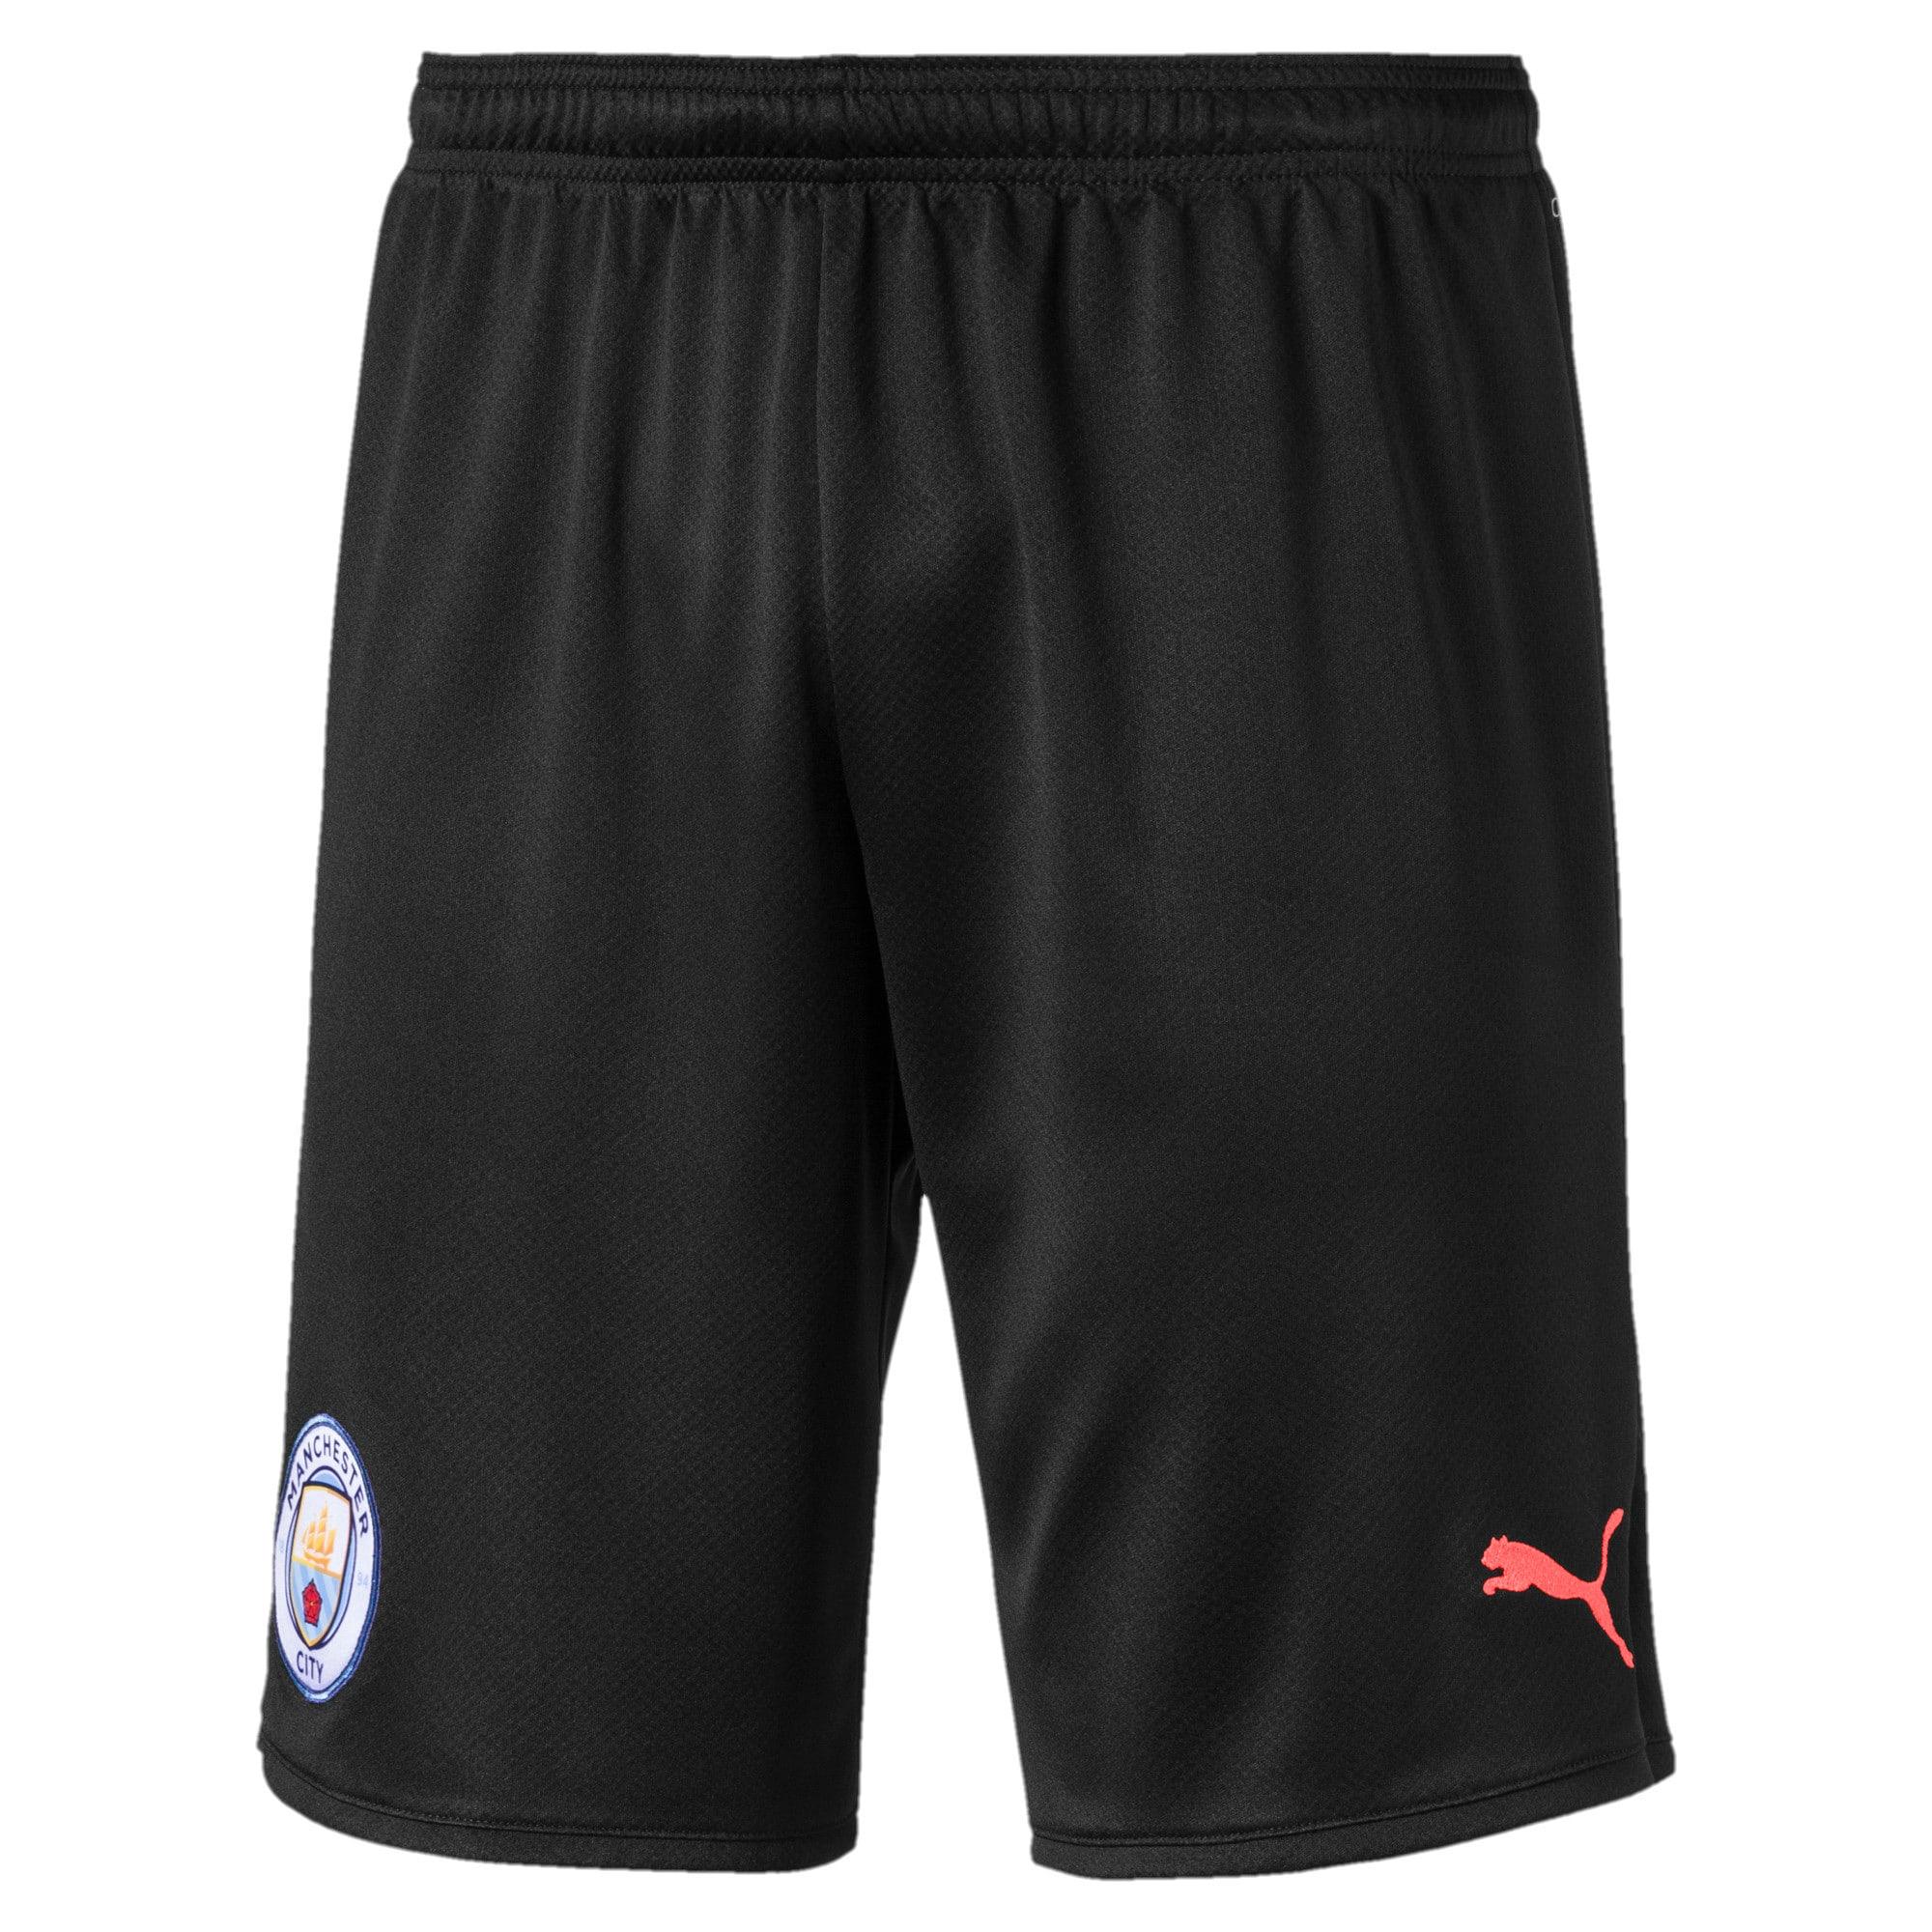 Thumbnail 1 of Man City Men's Third Replica Shorts, Puma Black-Georgia Peach, medium